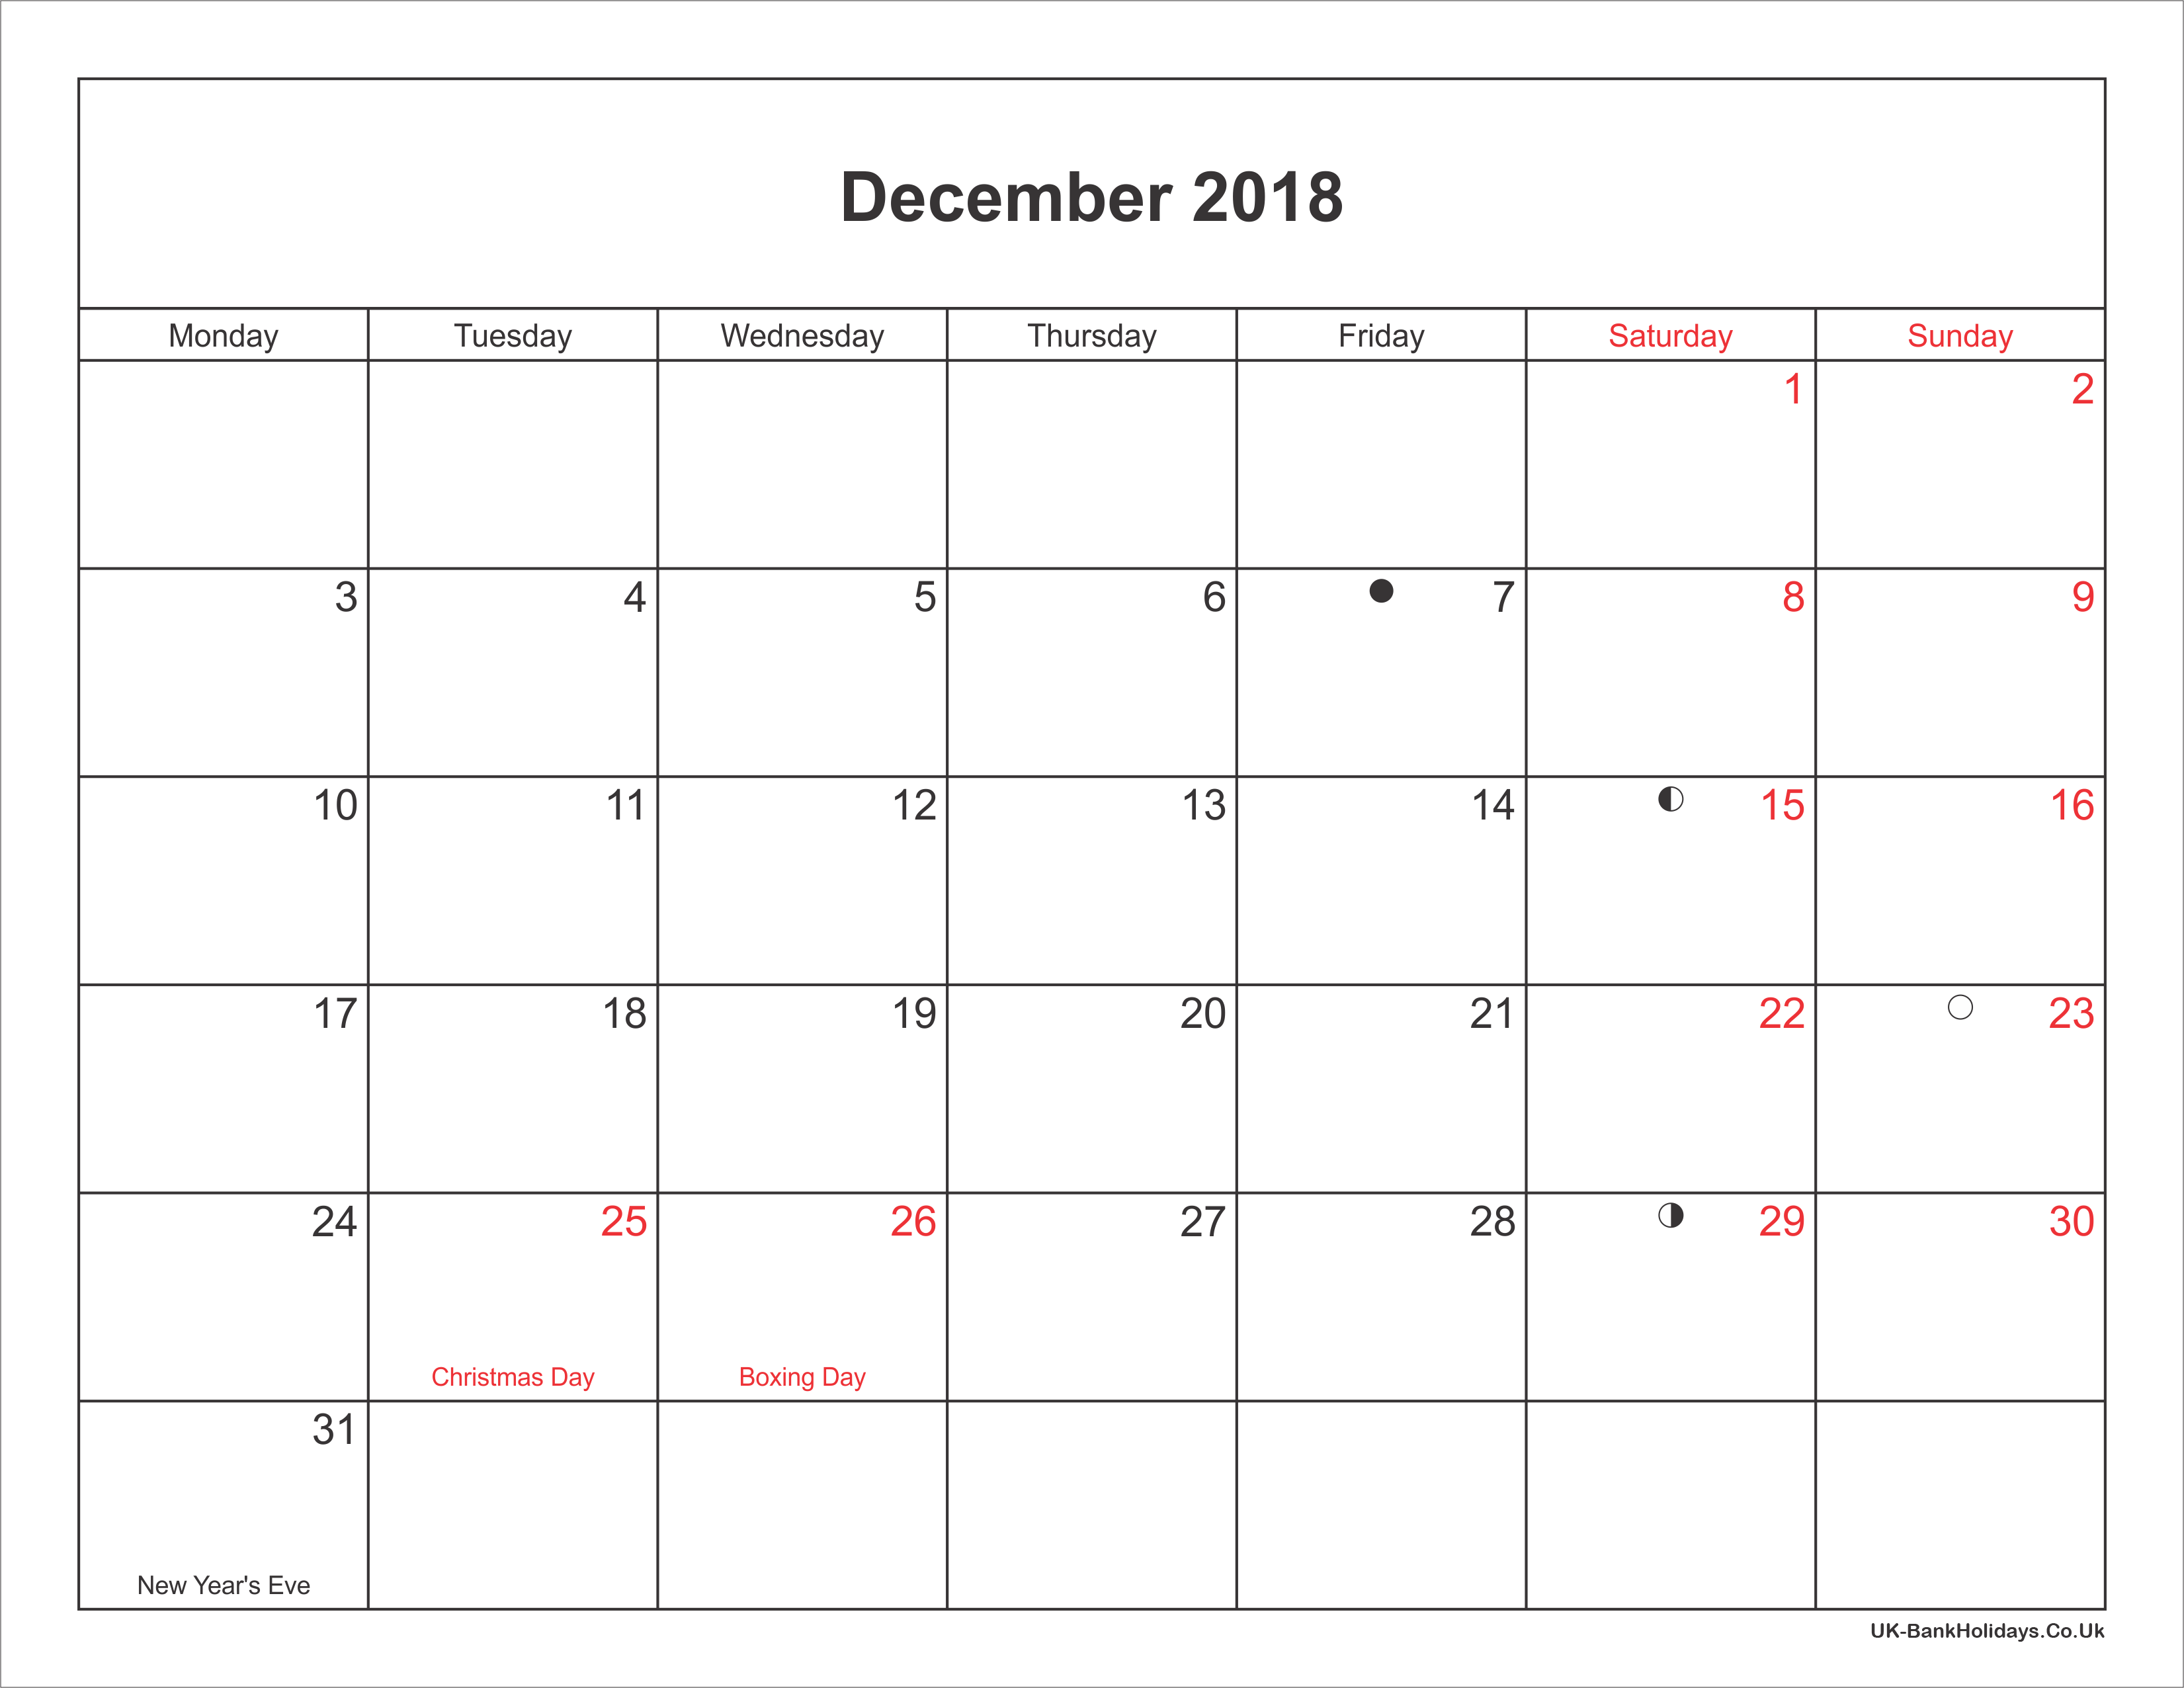 December Lunar Calendar 2017 >> Lunar Calendar Dec 2017 2019 2020 Top Upcoming Cars